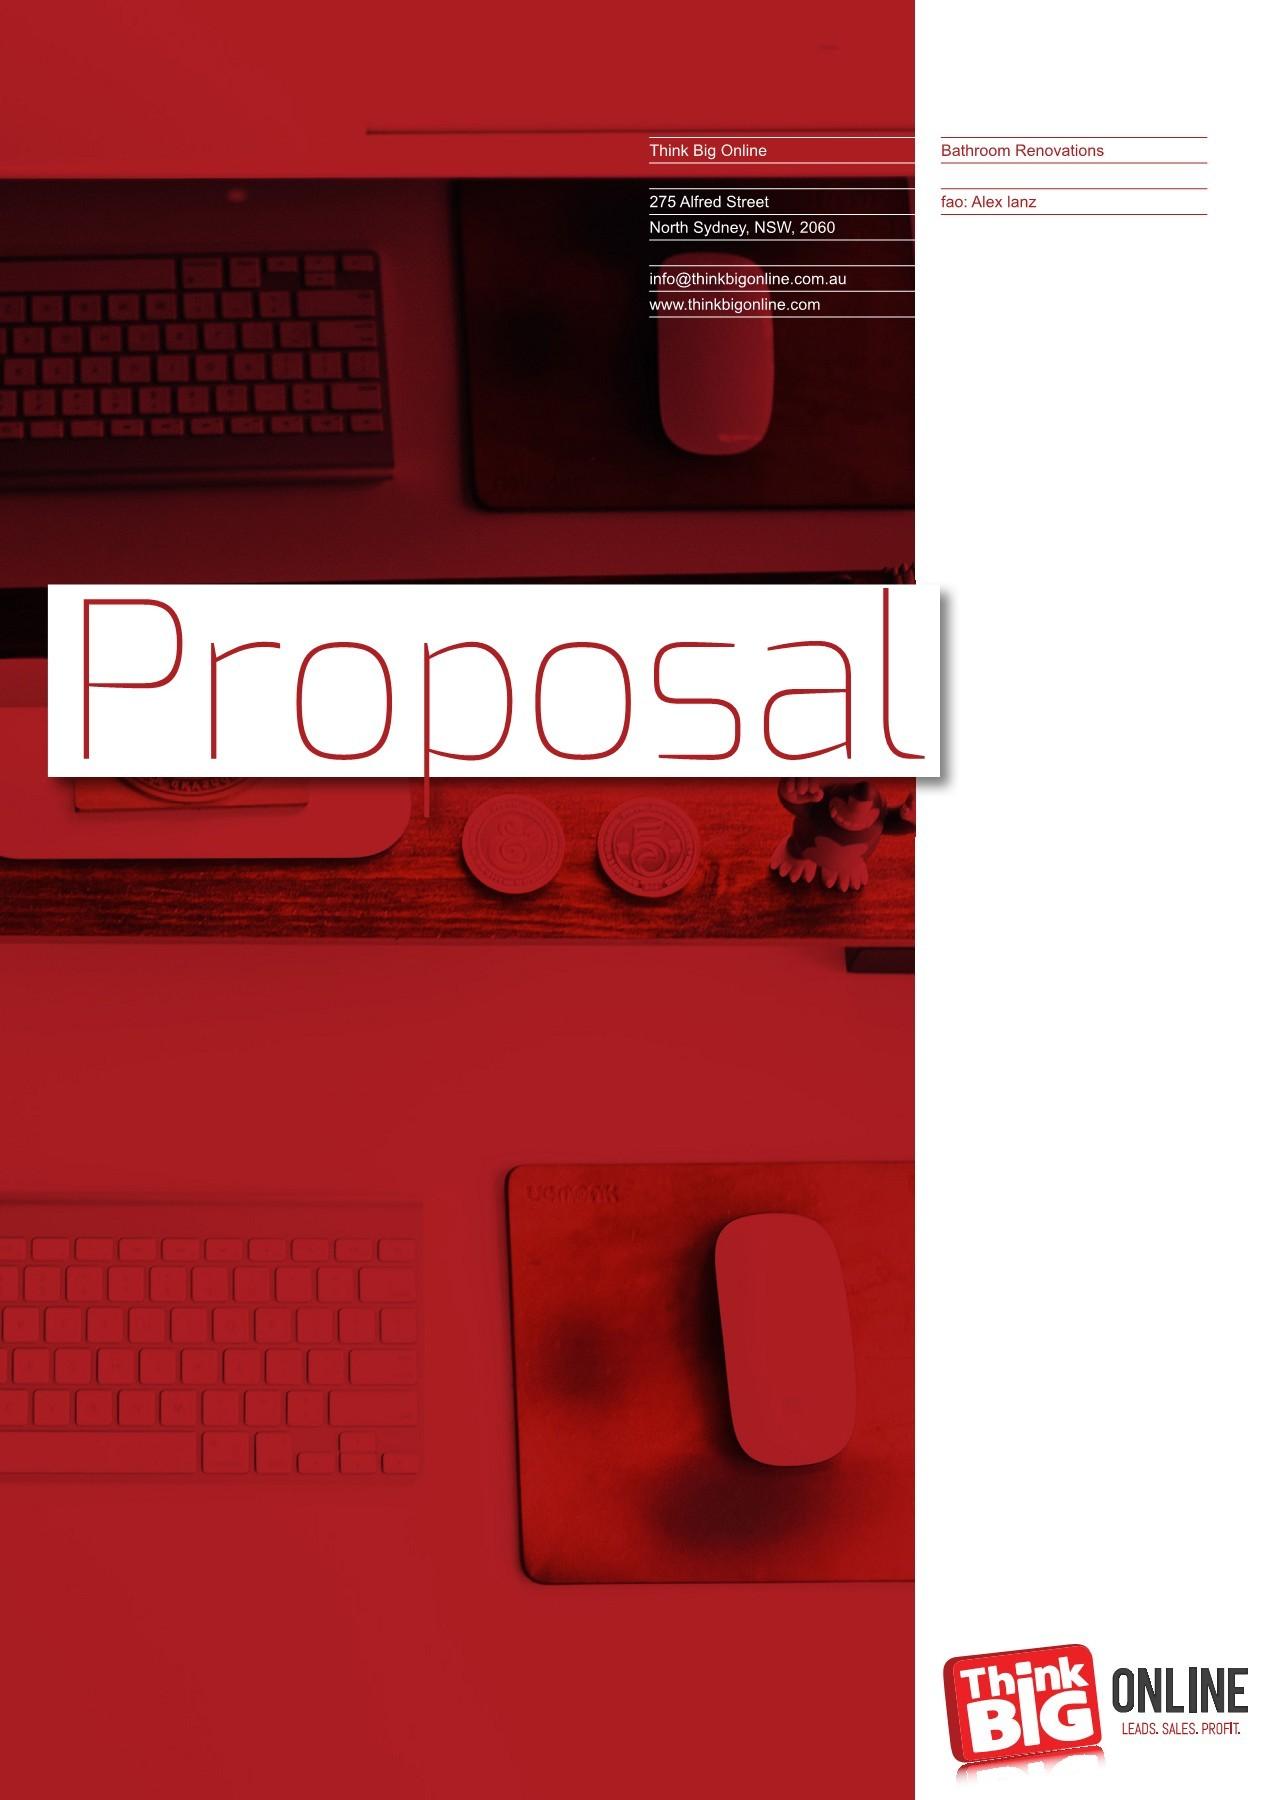 think big online proposal bathroom renovations fliphtml5